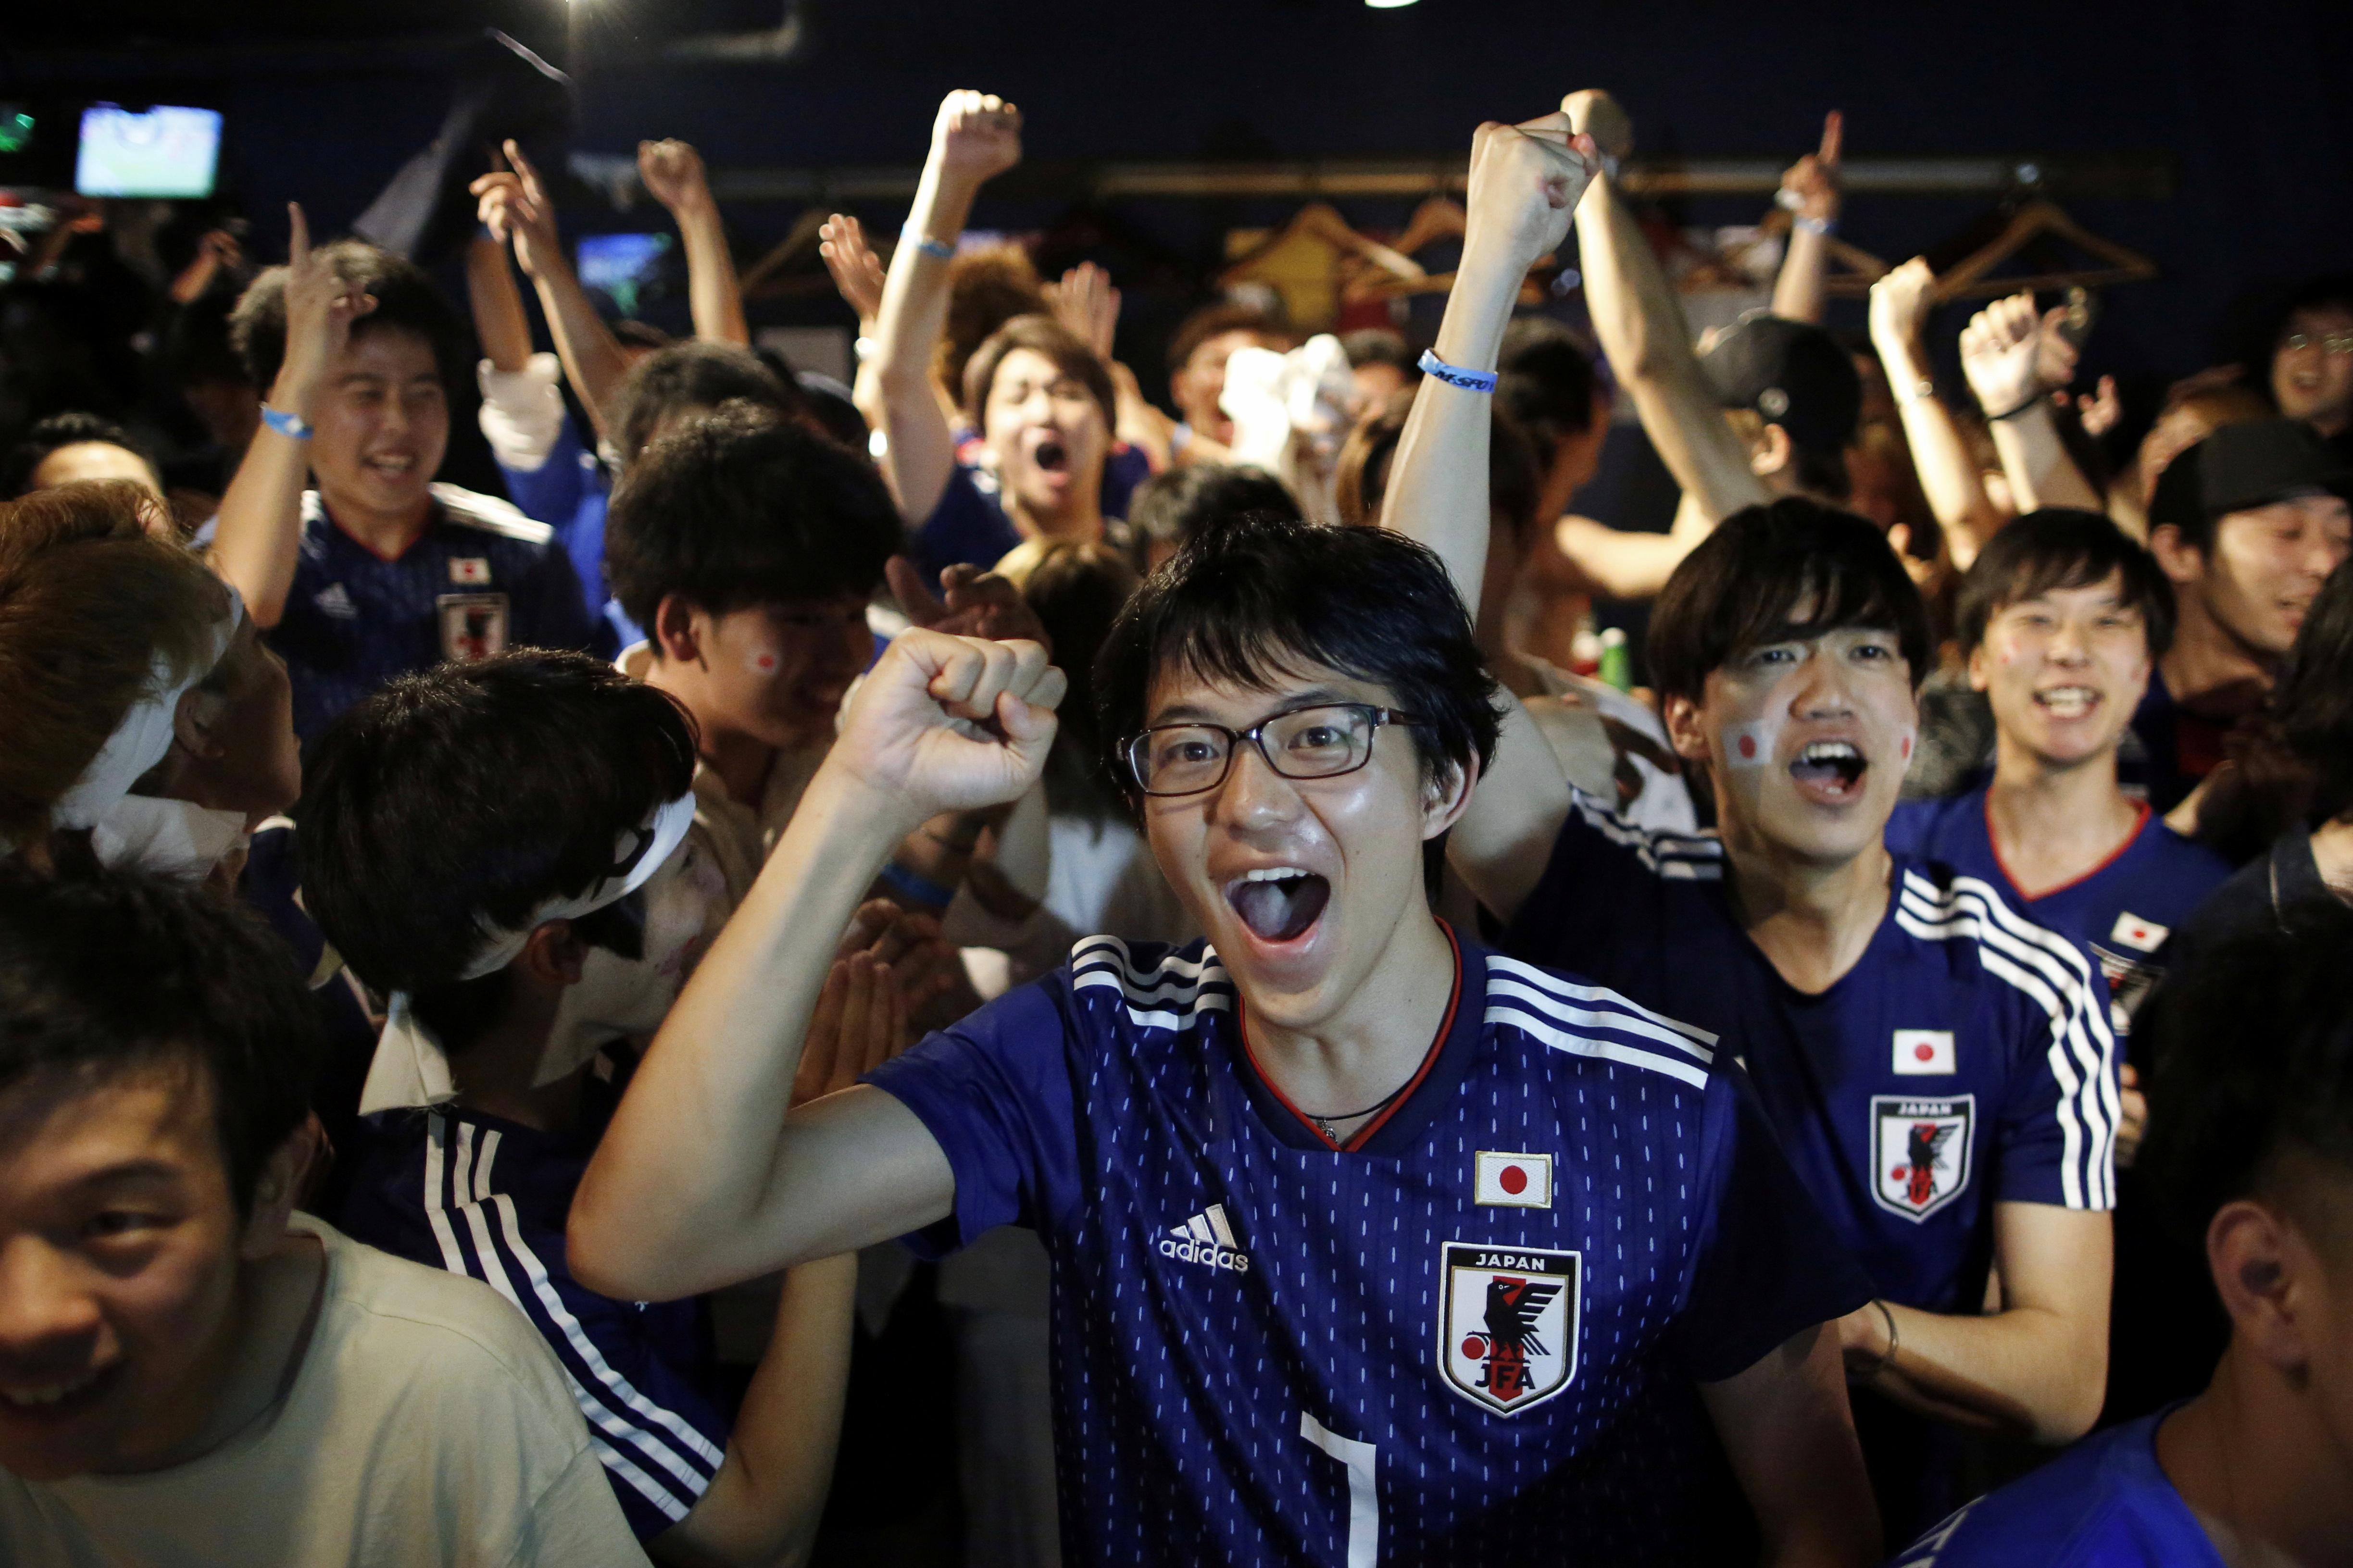 World Cup - Belgium vs Japan